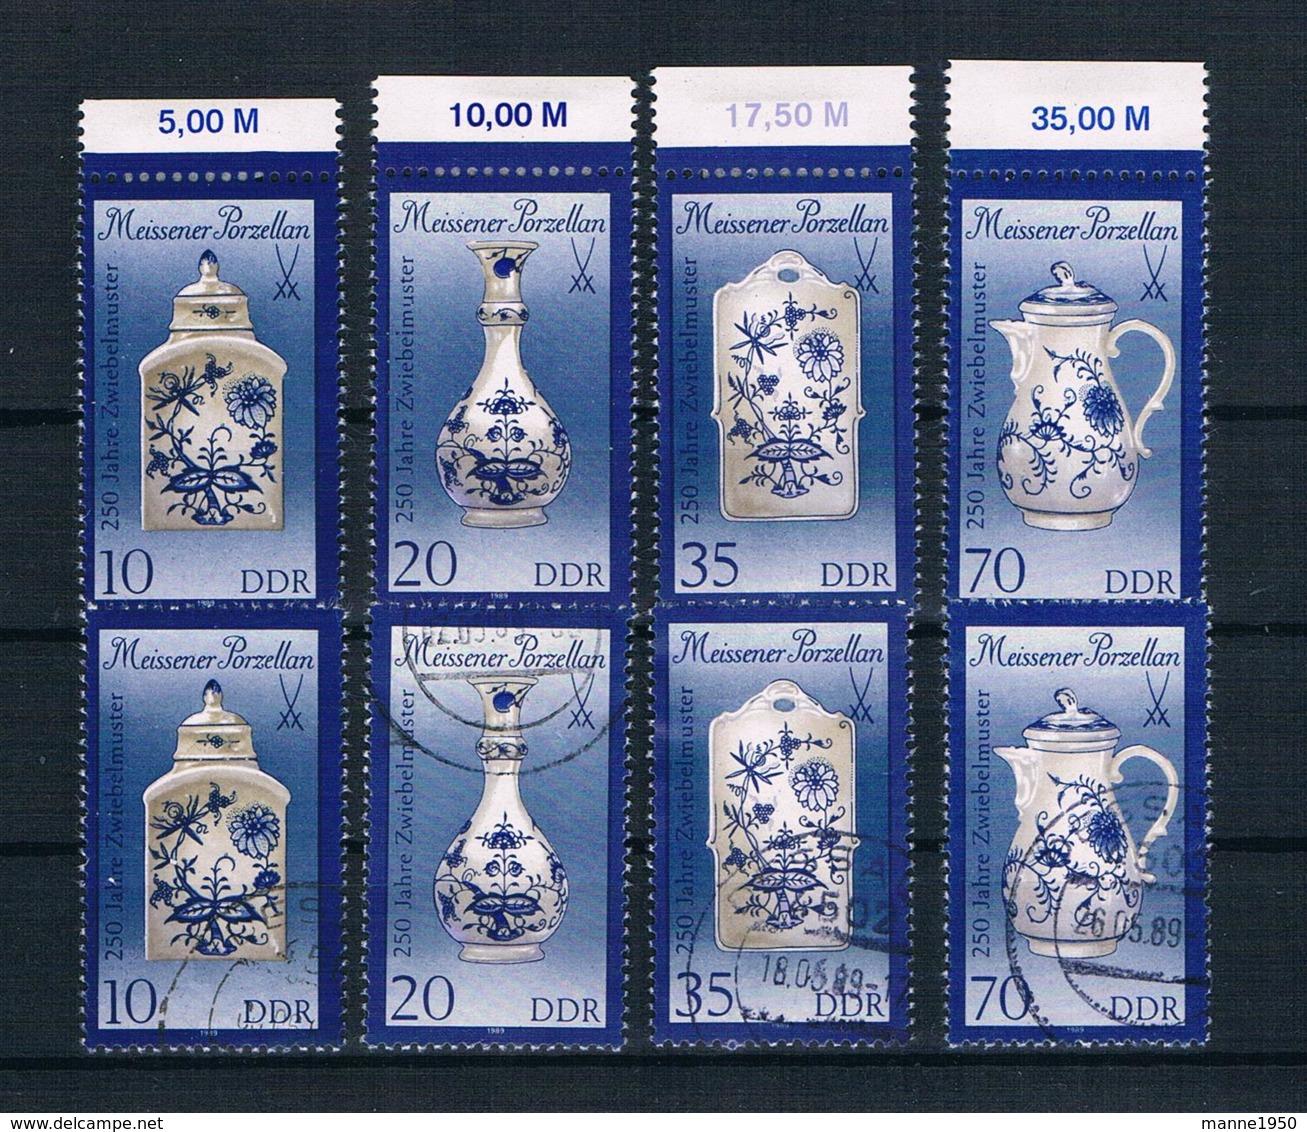 DDR 1989 Porzellan Mi.Nr. 3241/44 I Kpl. Satz ** + Gestempelt - Neufs